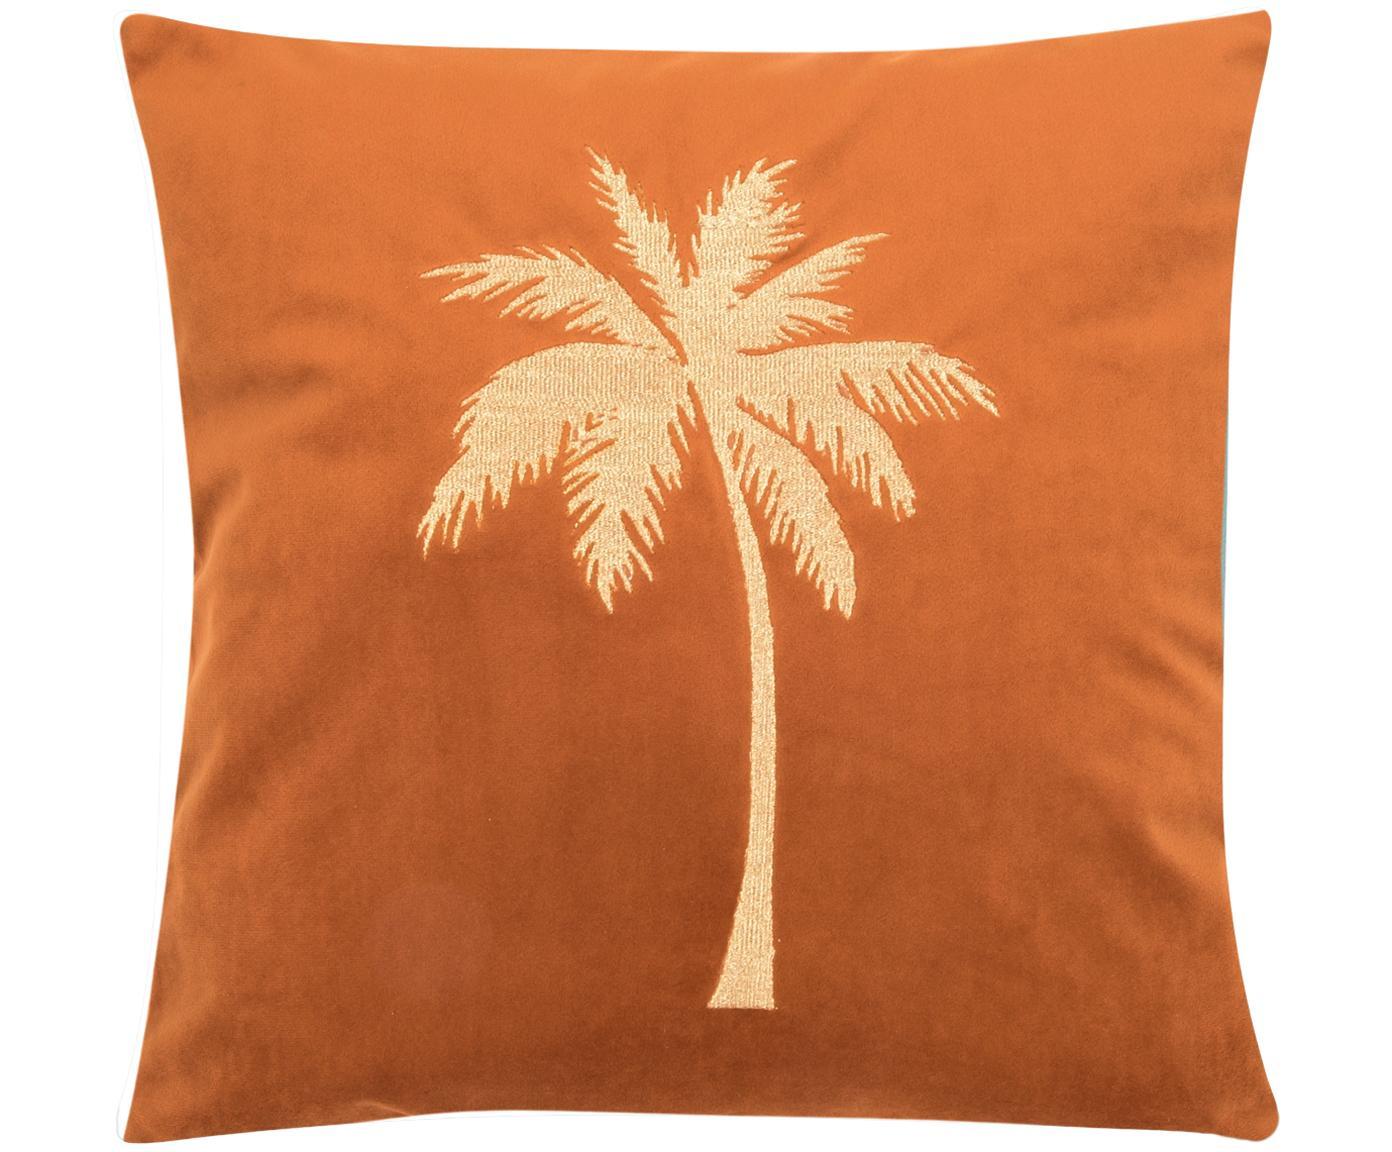 Funda de cojín bordada de terciopelo brillante Palmsprings, Terciopelo de poliéster, Naranja, dorado, An 40 x L 40 cm